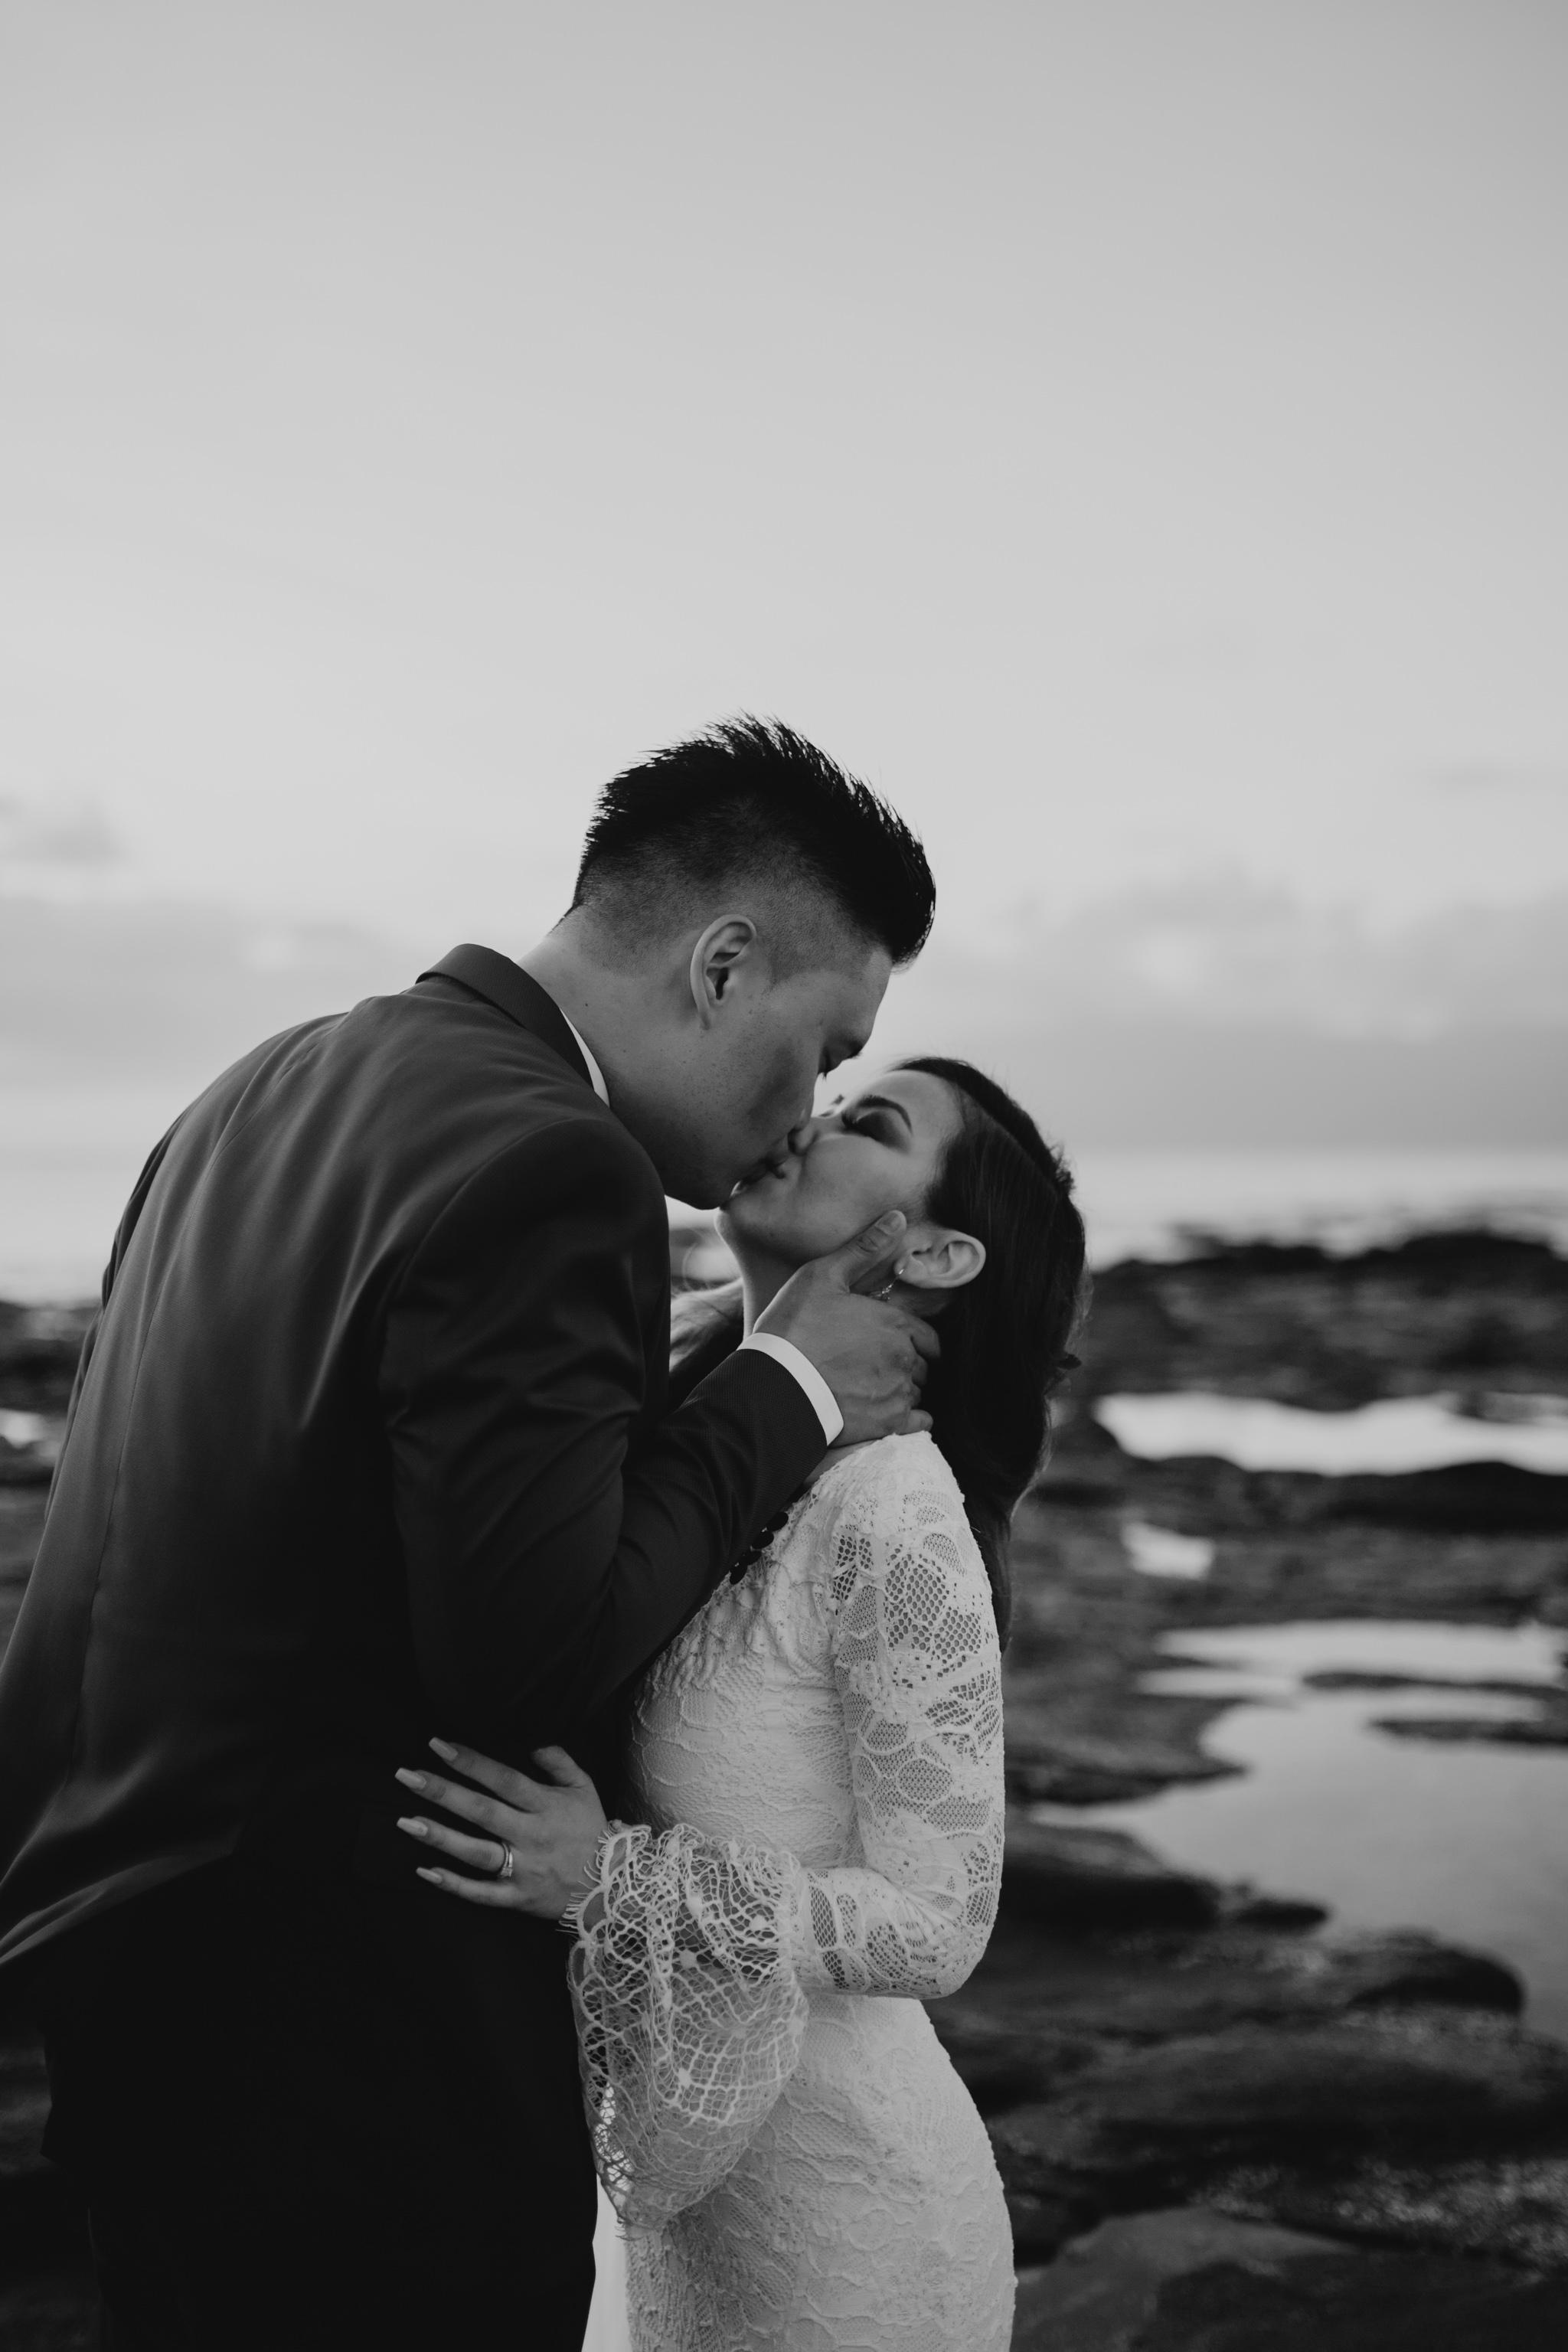 Maui Wedding Photos  Merriman's Kapalua Maui wedding by Hawaii wedding photographer Desiree Leilani